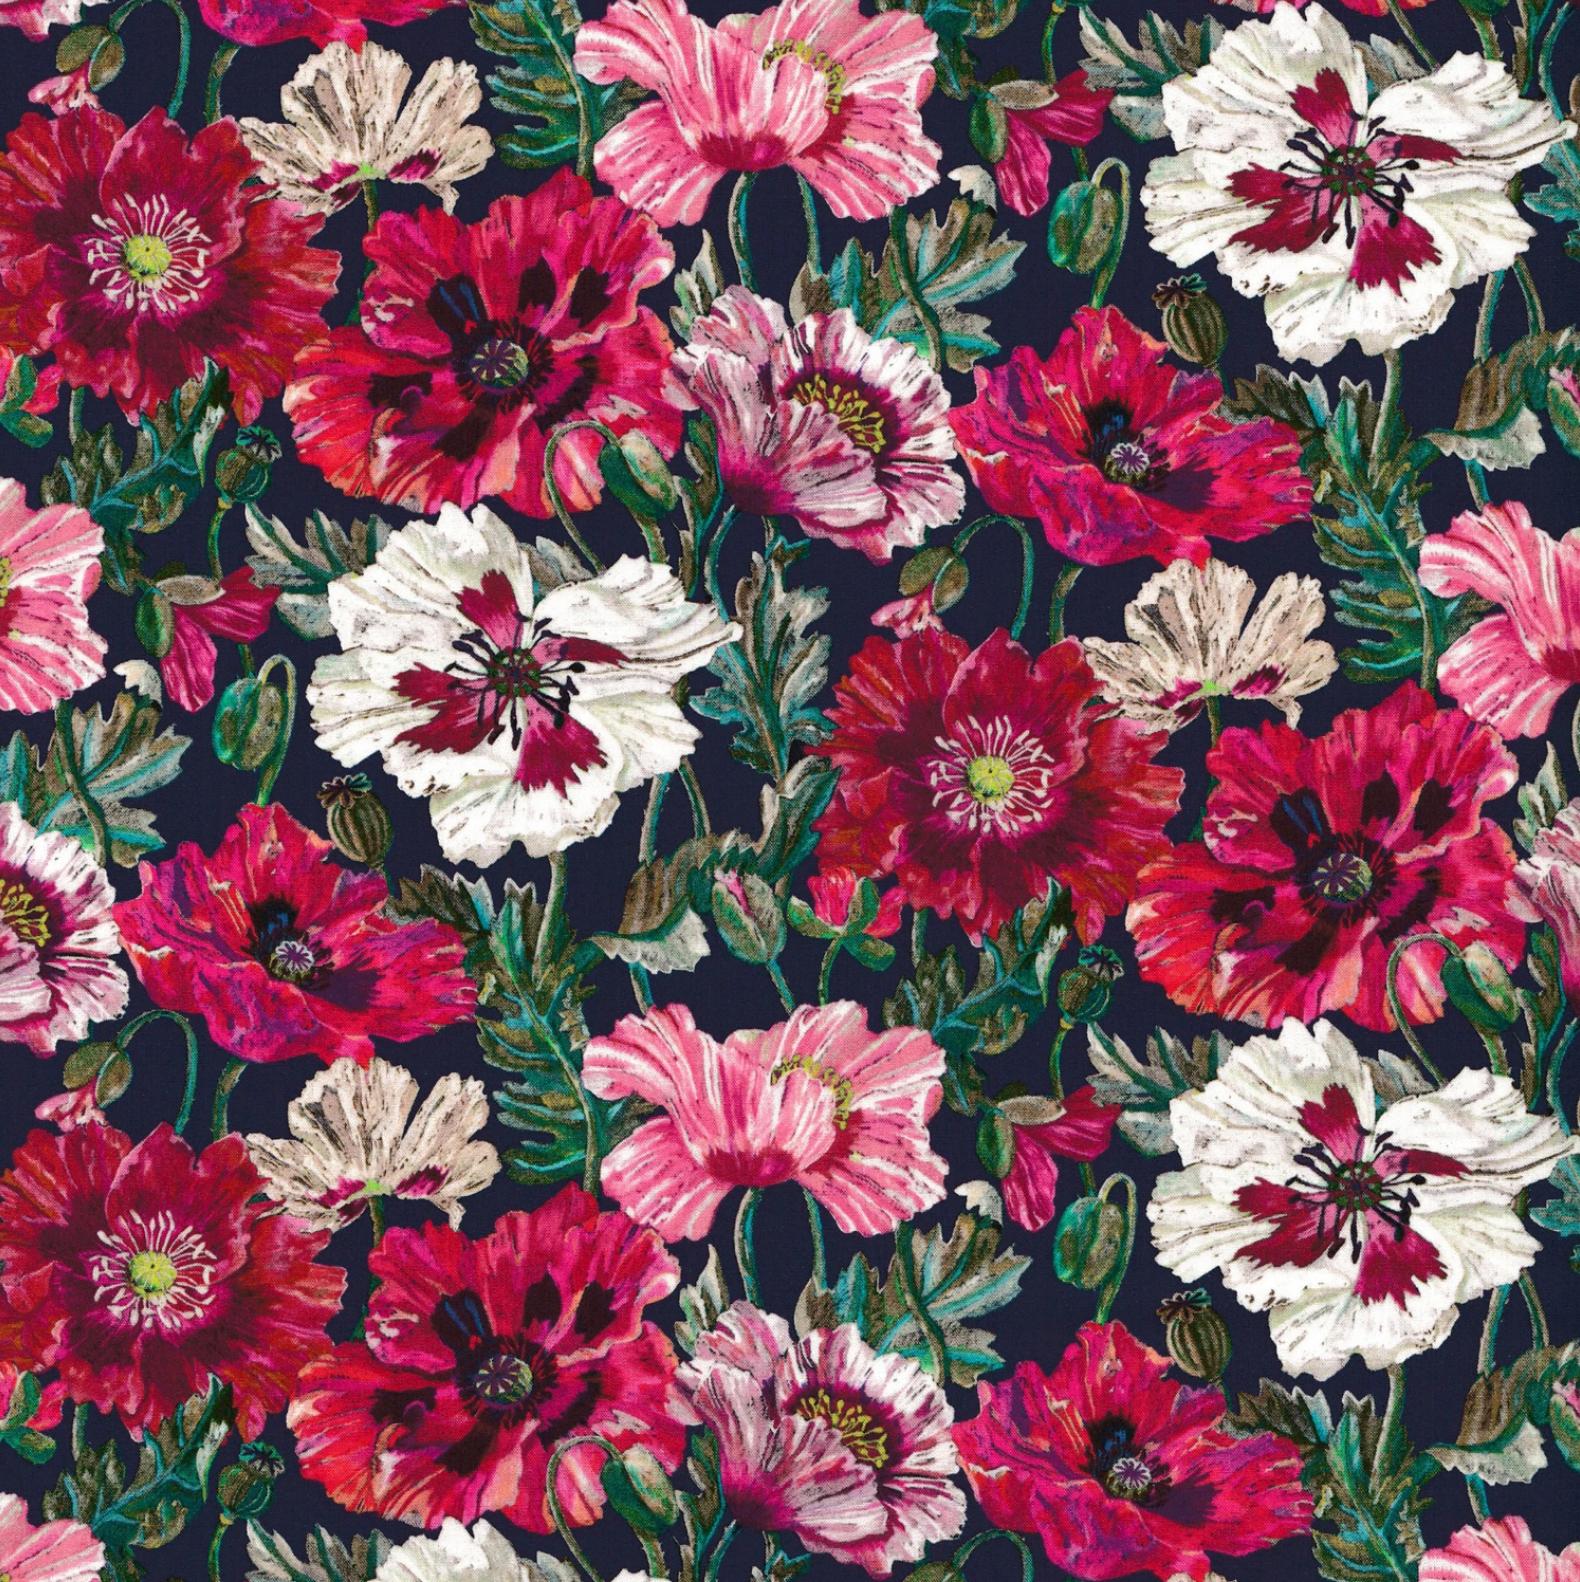 Poppy Amelie A - Tana Lawn - Liberty of London